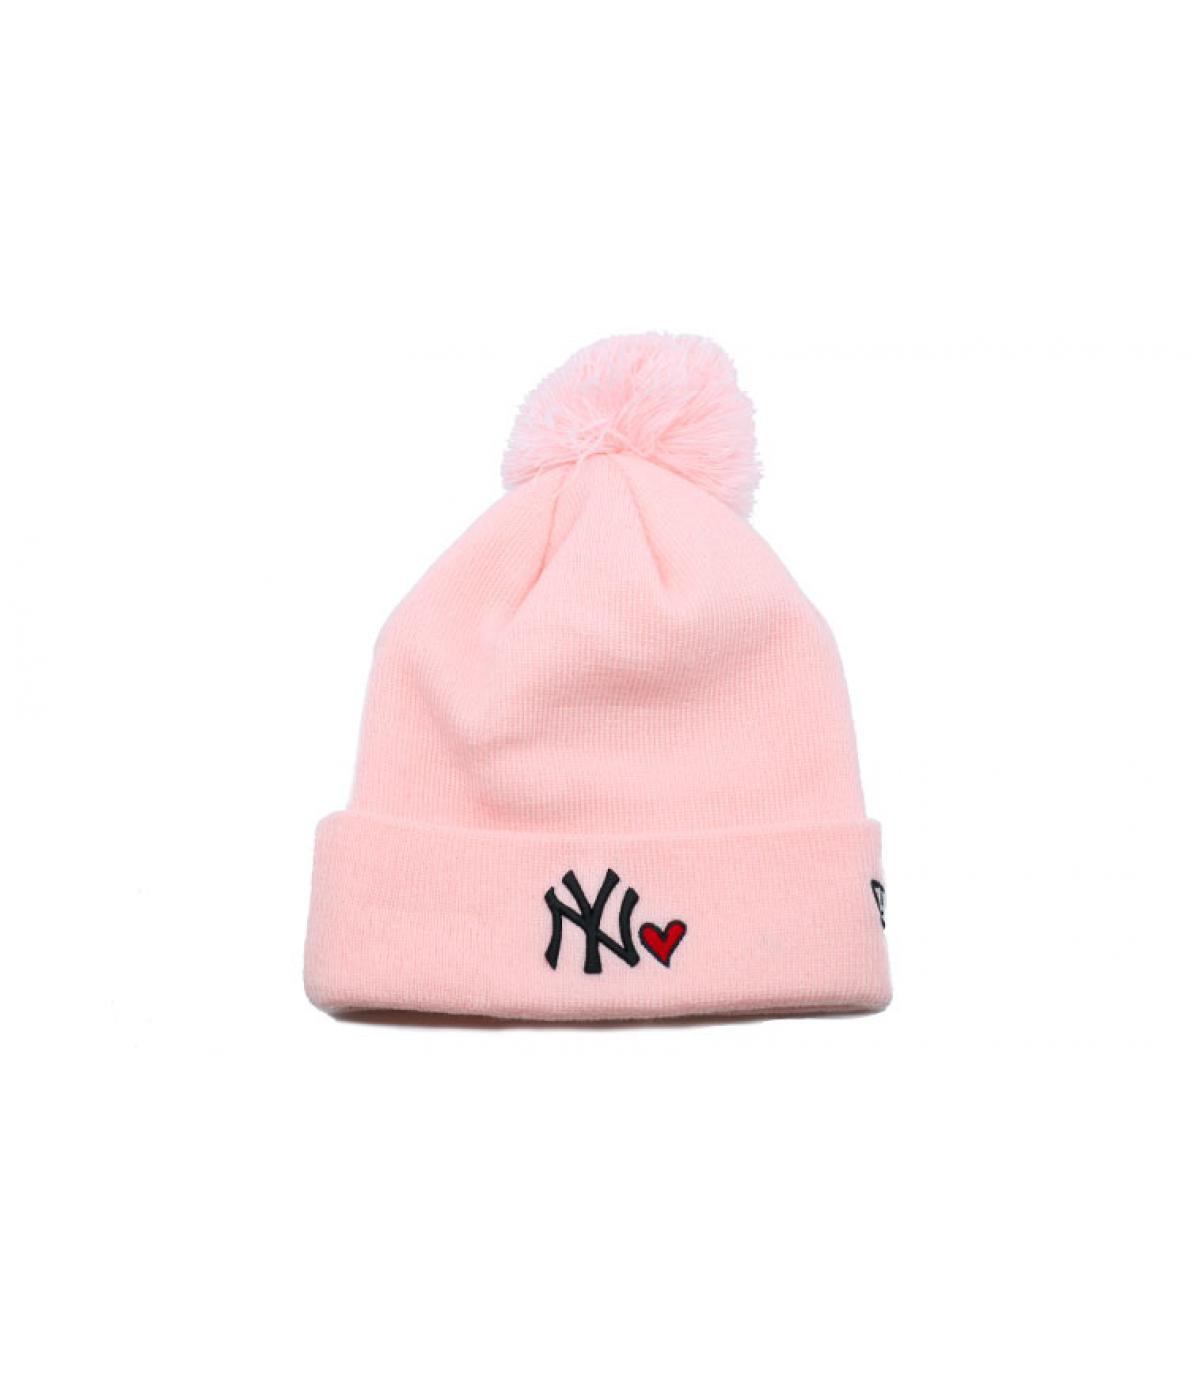 Détails Wmns Heart NY knit pink - image 2